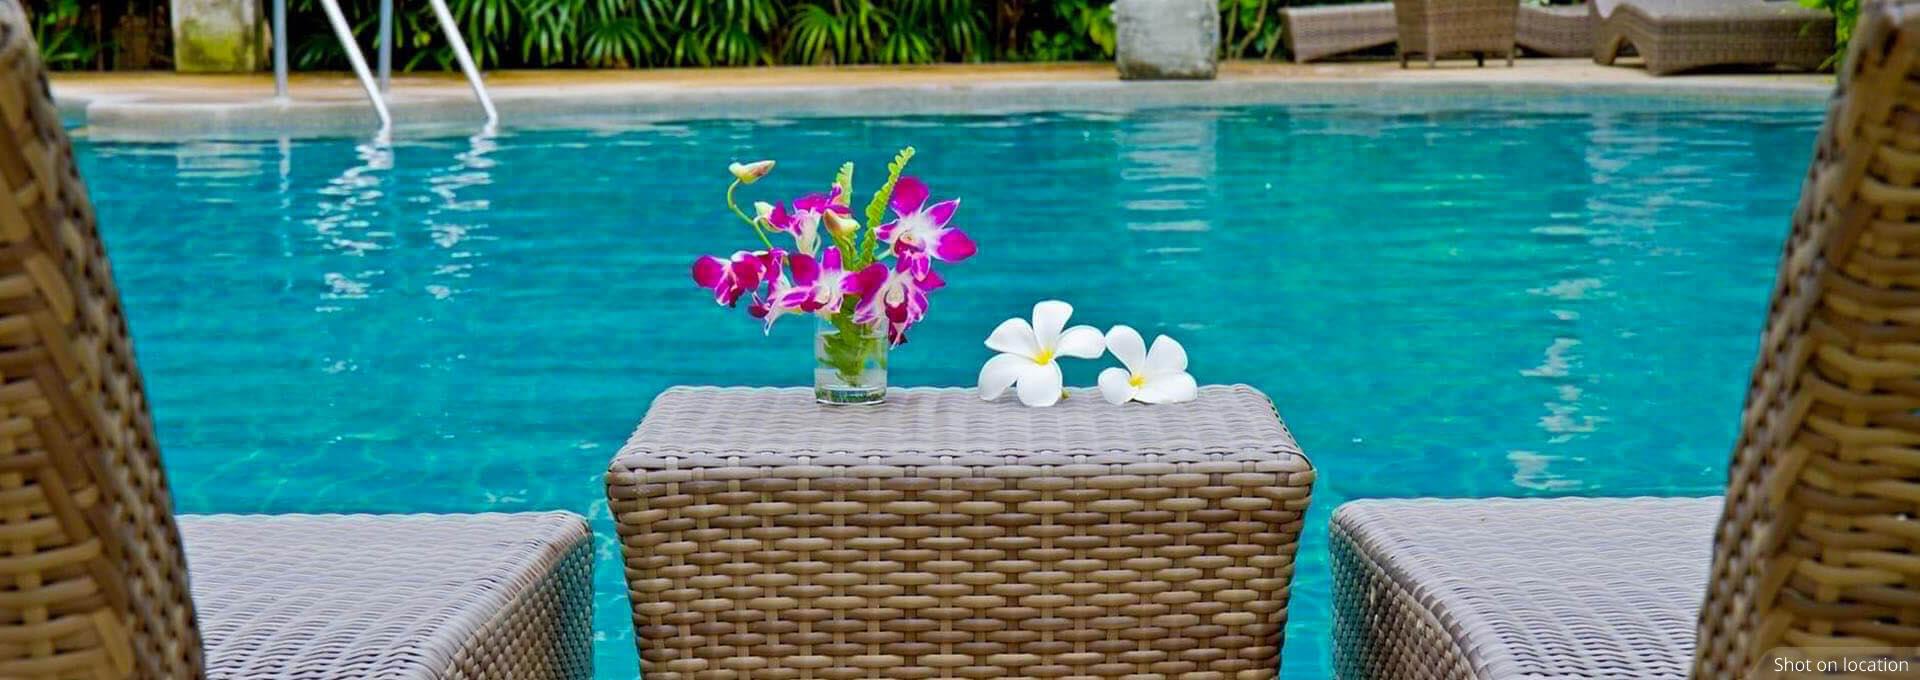 Swimming Pool in Calgary by House of Hiranandani in Devanahalli, Bengaluru